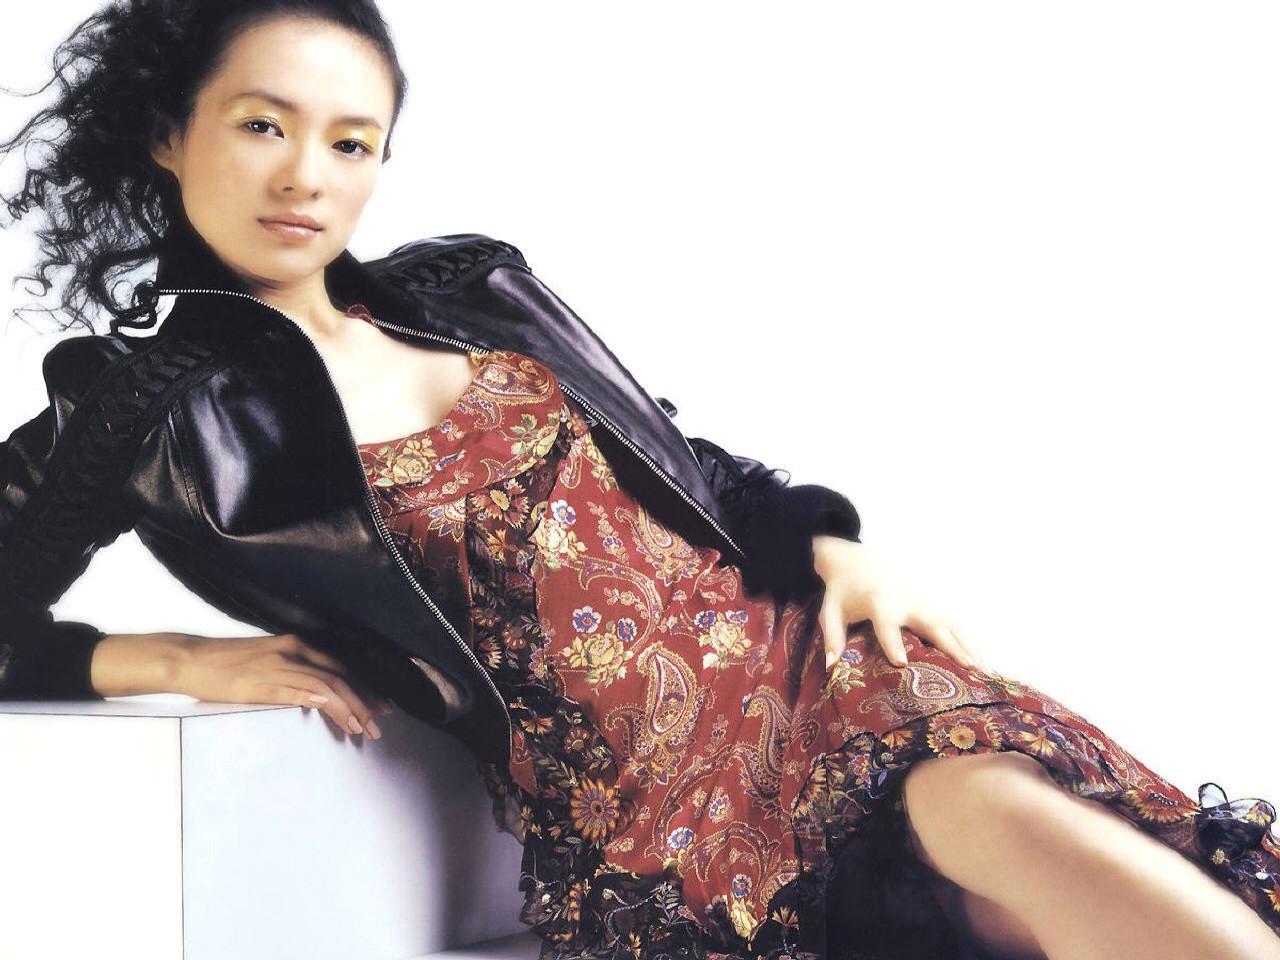 Wallpaper dell'attrice Zhang Ziyi su fondo bianco